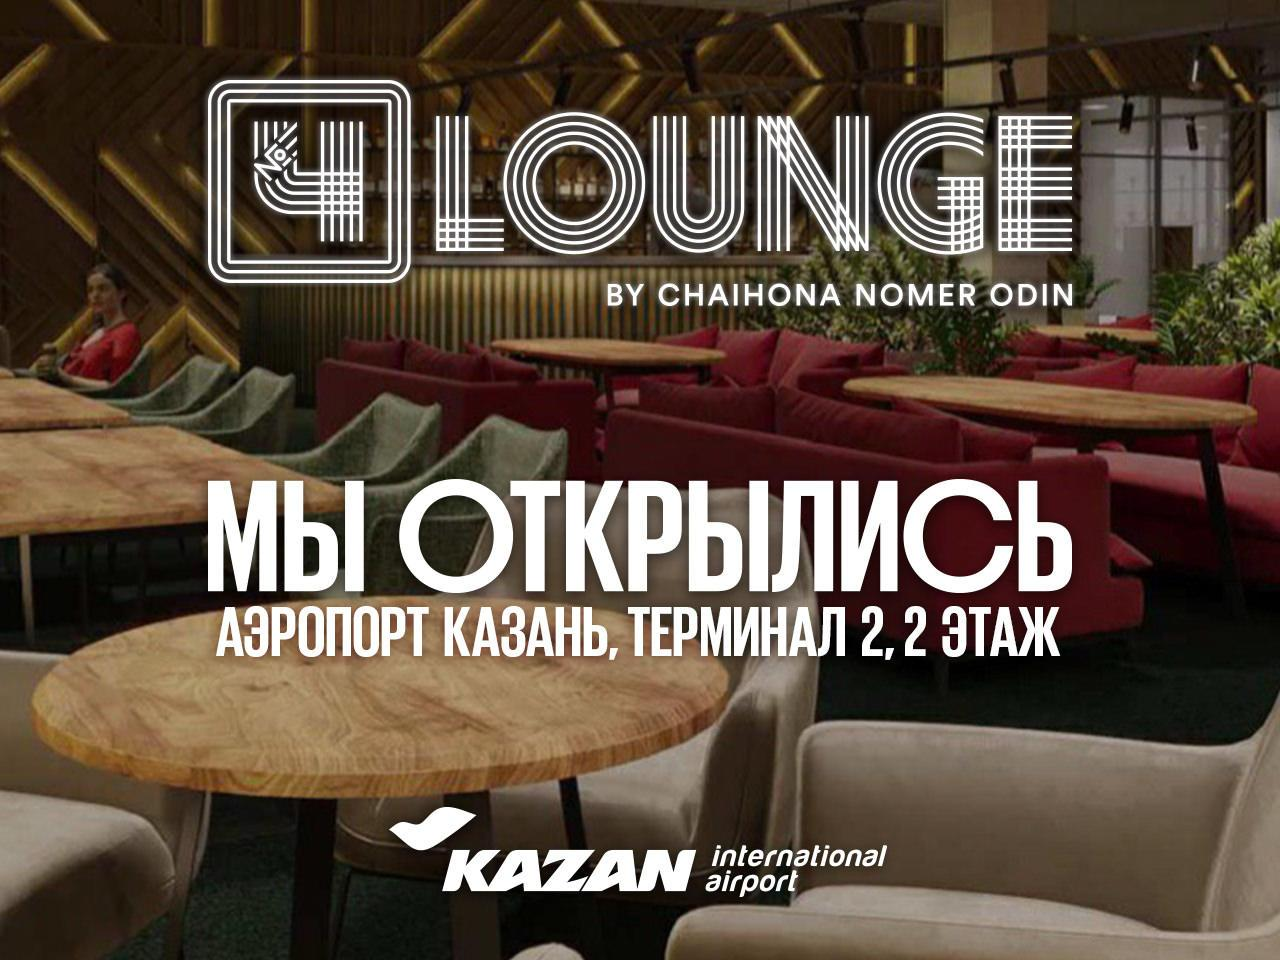 Ч1 Lounge в Казани!